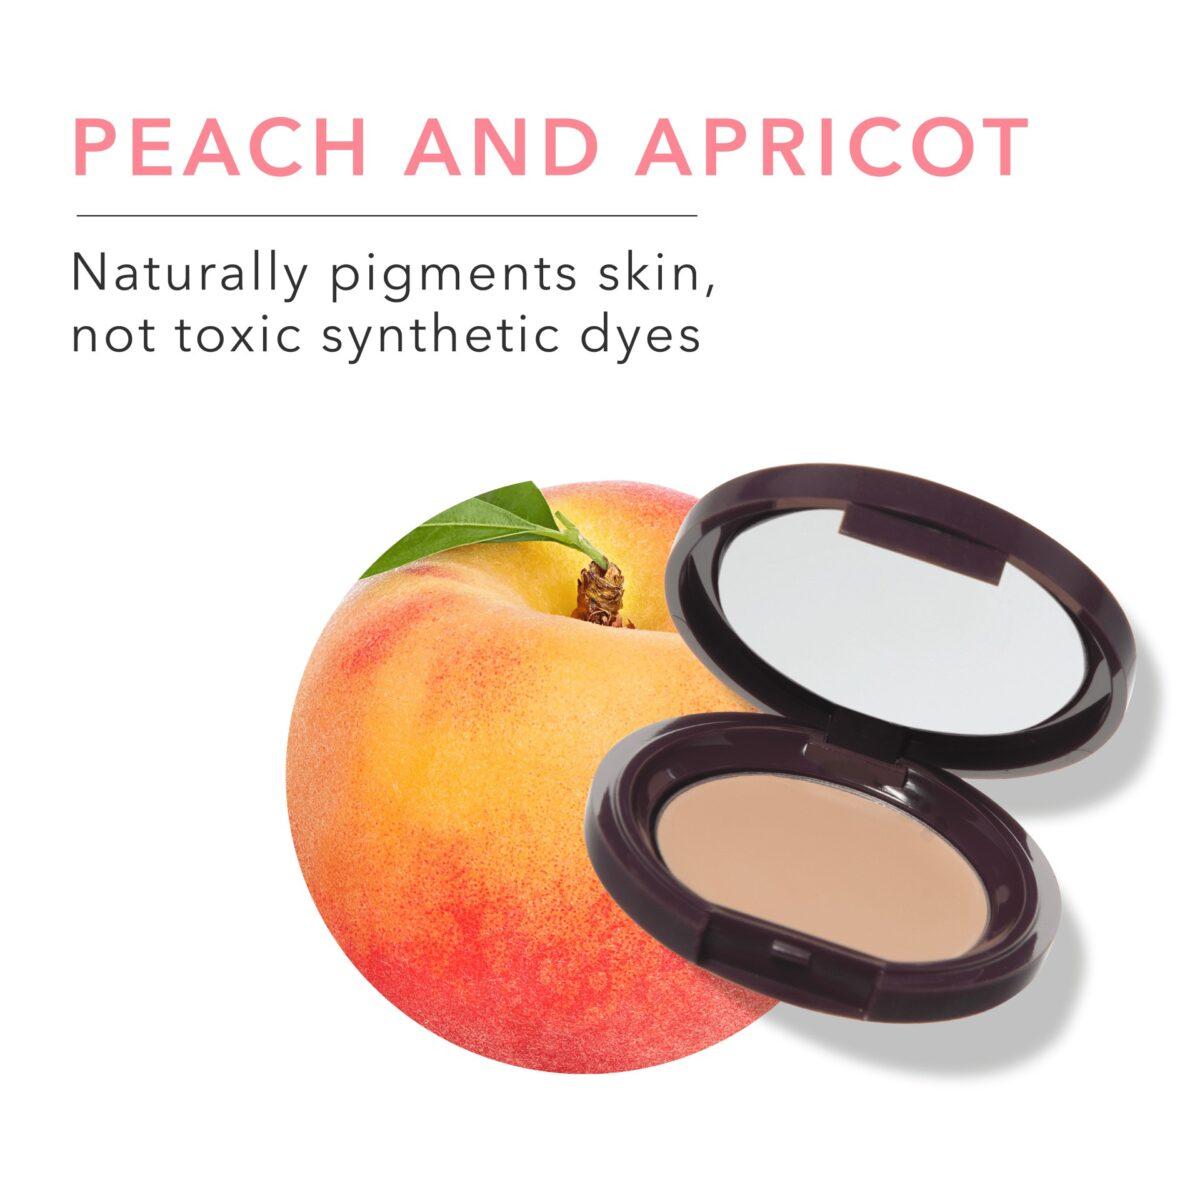 Fruit Pigmented® Long Last Concealer With Super Fruits All Skin Types Fruit Pigmented®Make Up